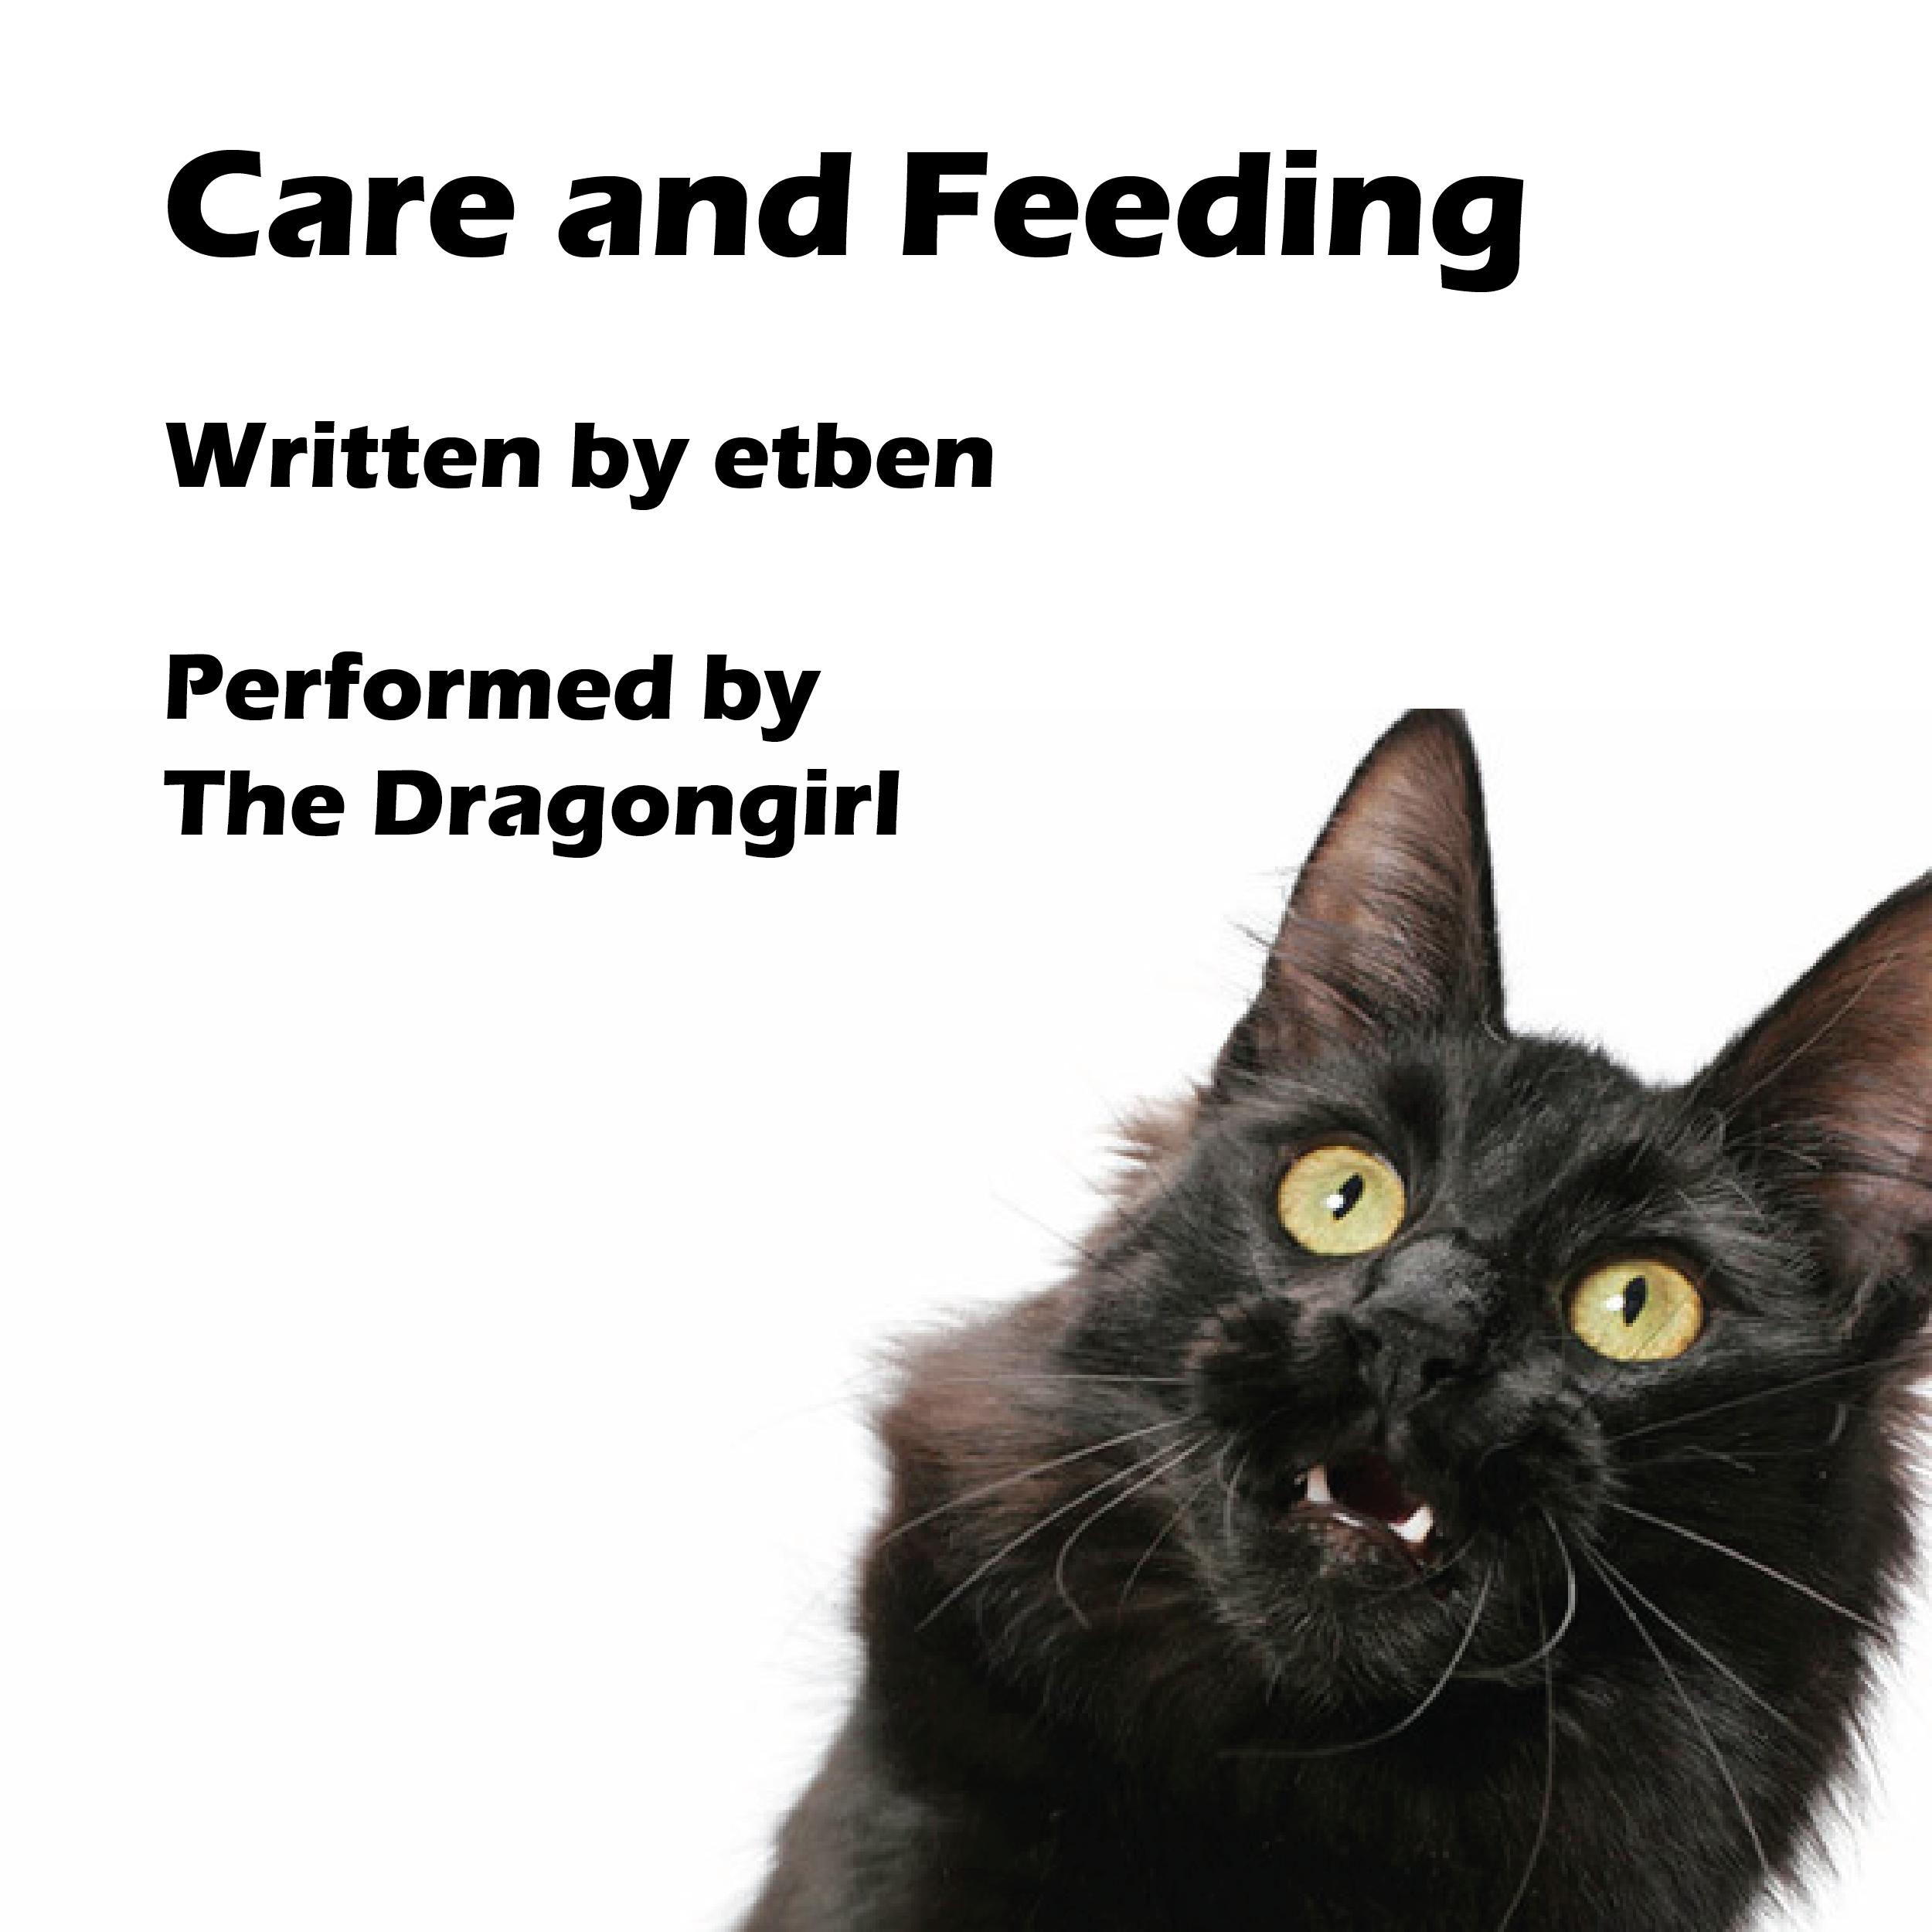 Care and Feeding Album Cover